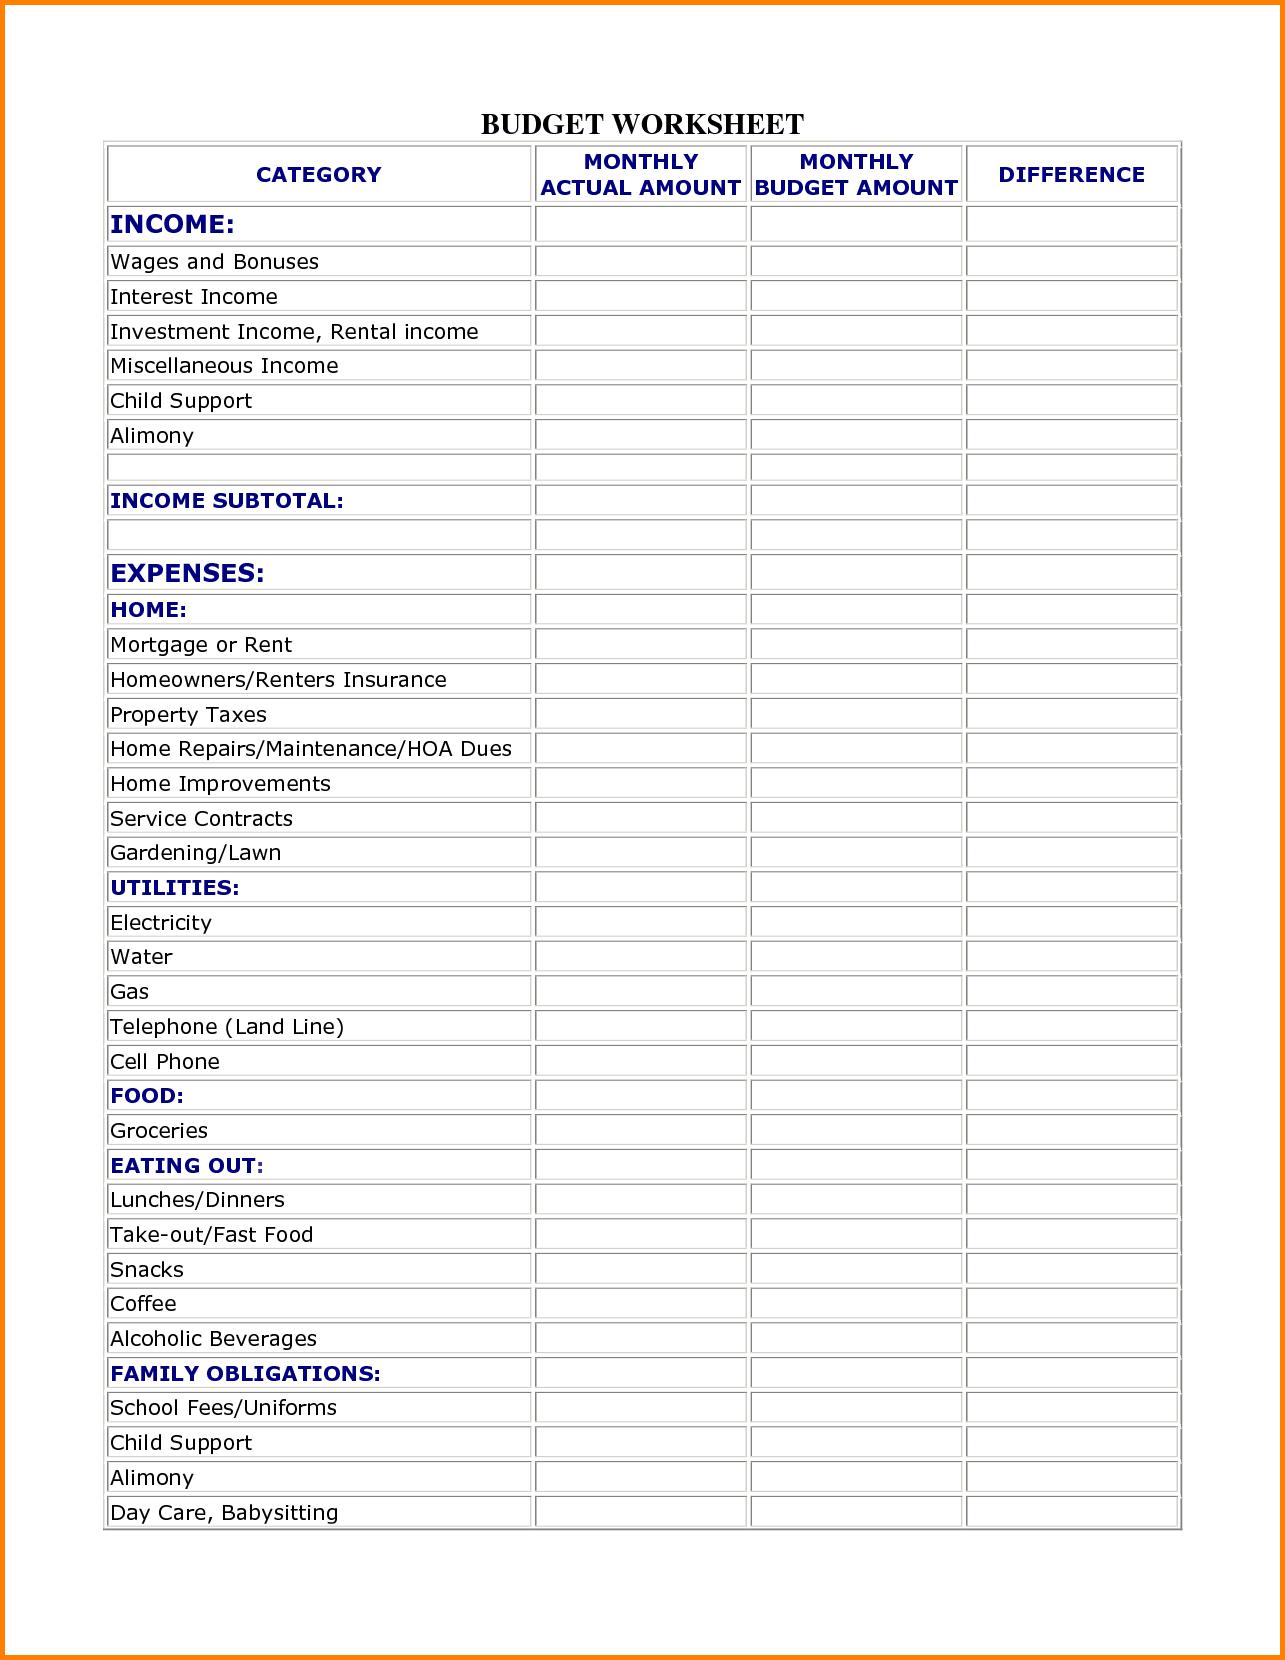 Worksheets Family Budget Worksheets family budget template printable best monthly free worksheet household